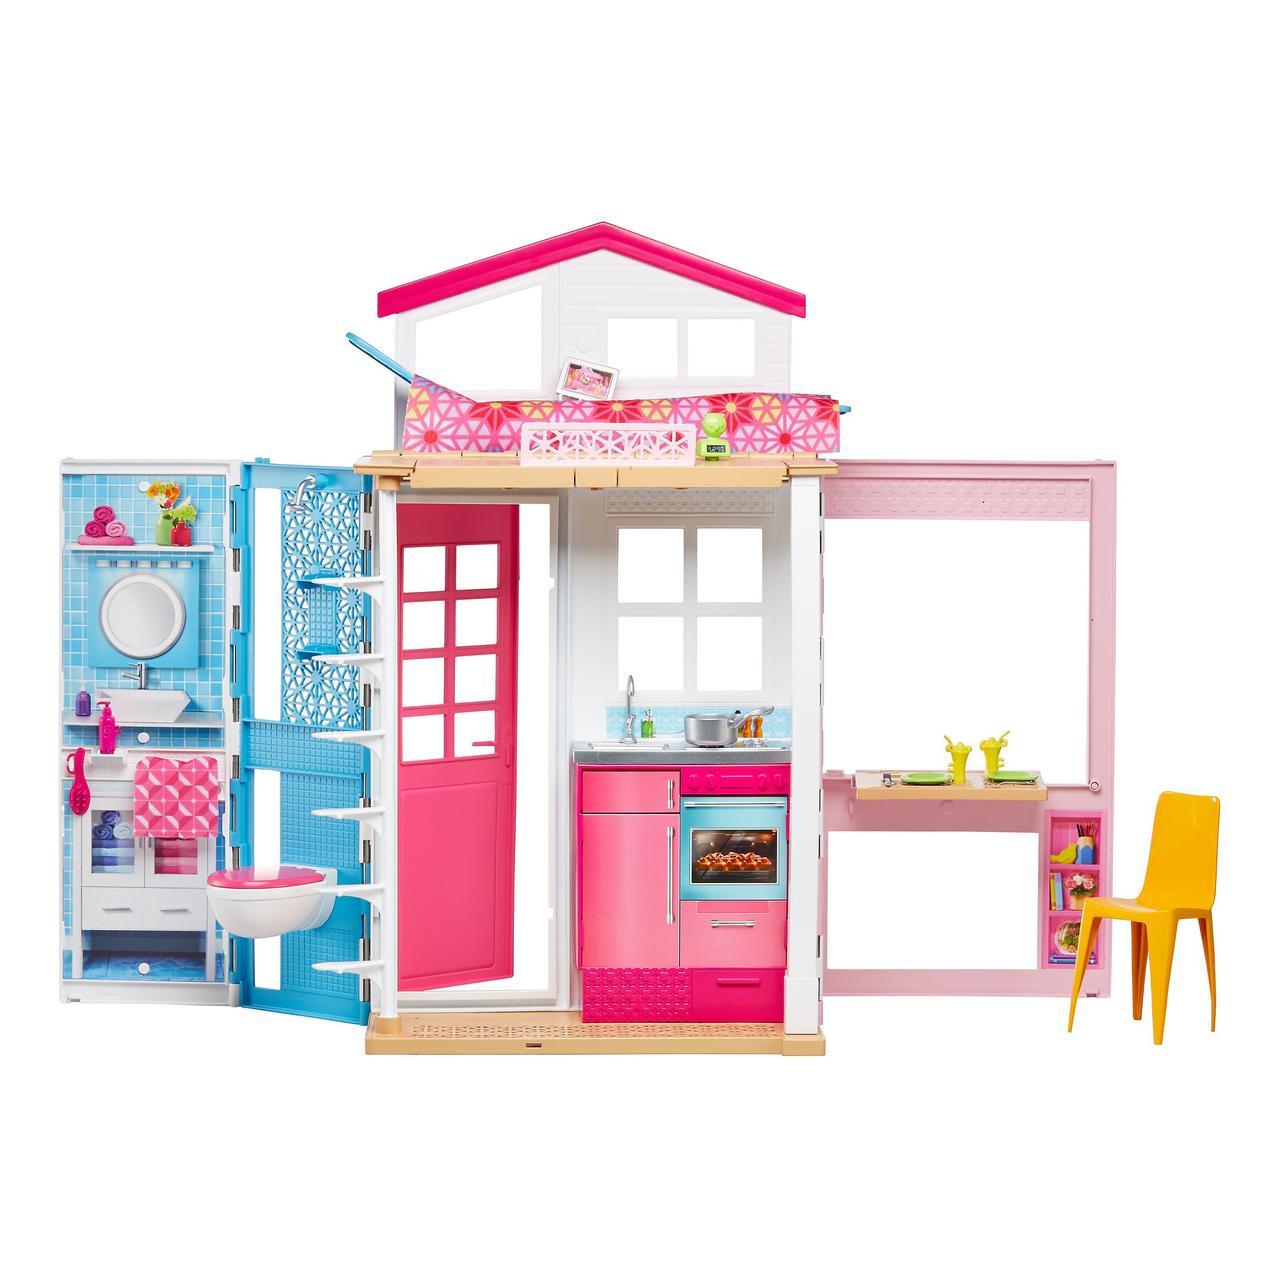 Barbie Гламурный портативный домик Барби без куклы дом 2-Story House DVV47 Close-and-Go Portable Playset